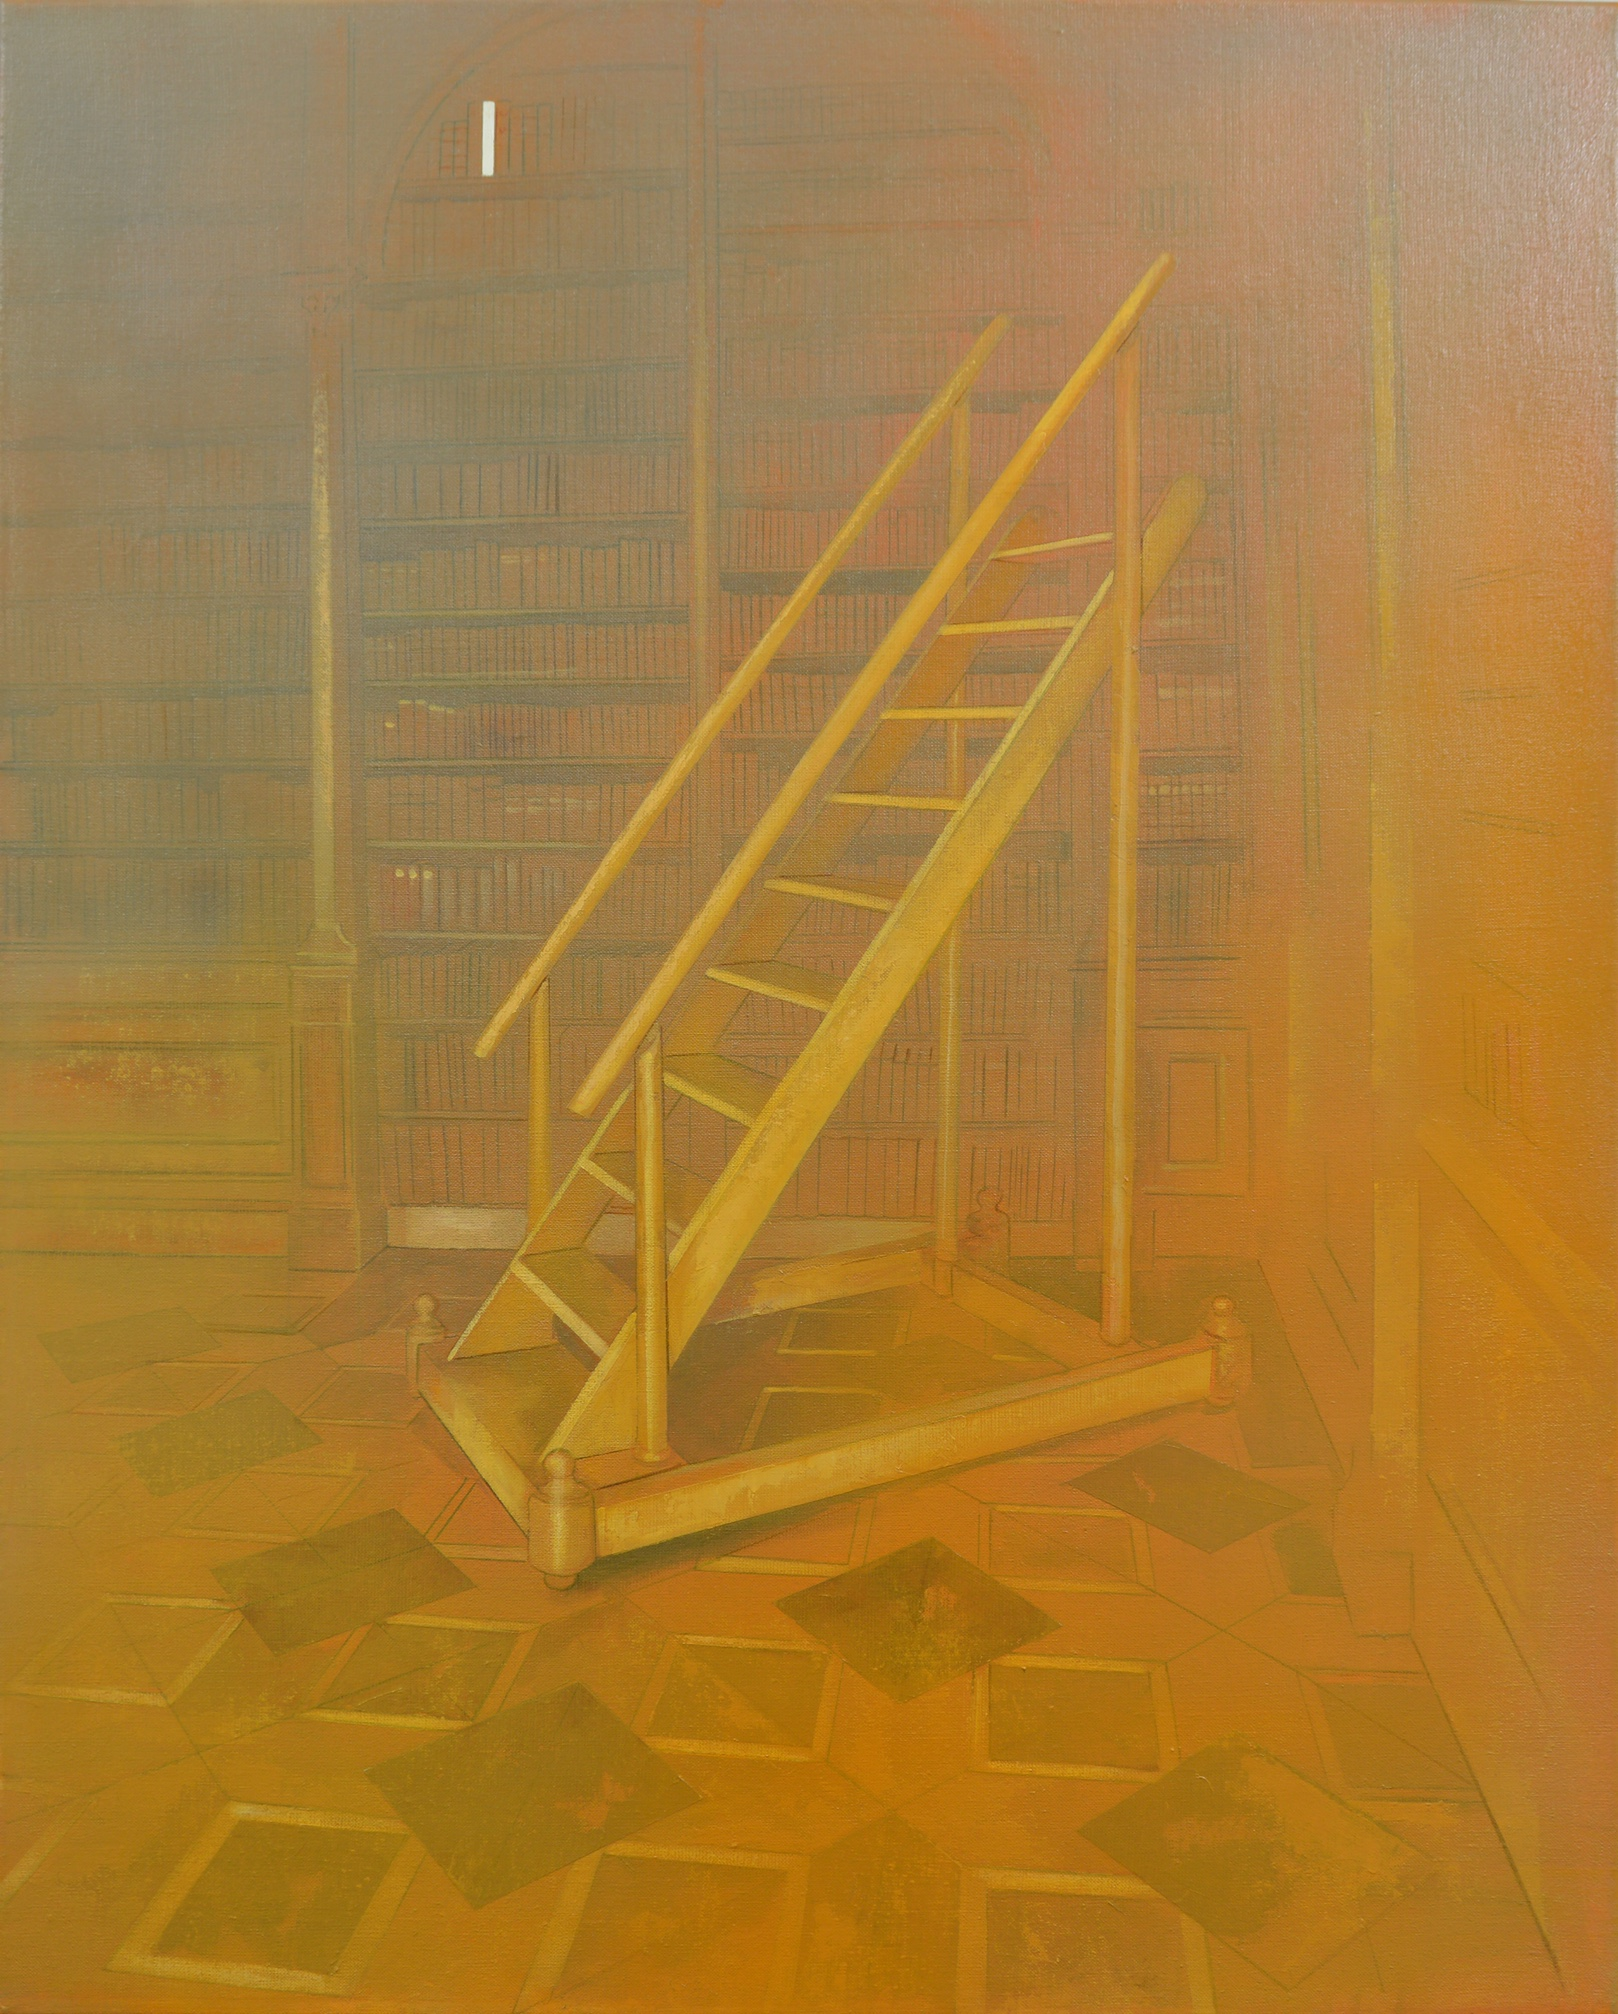 Kondor, Attila: Bibliothek